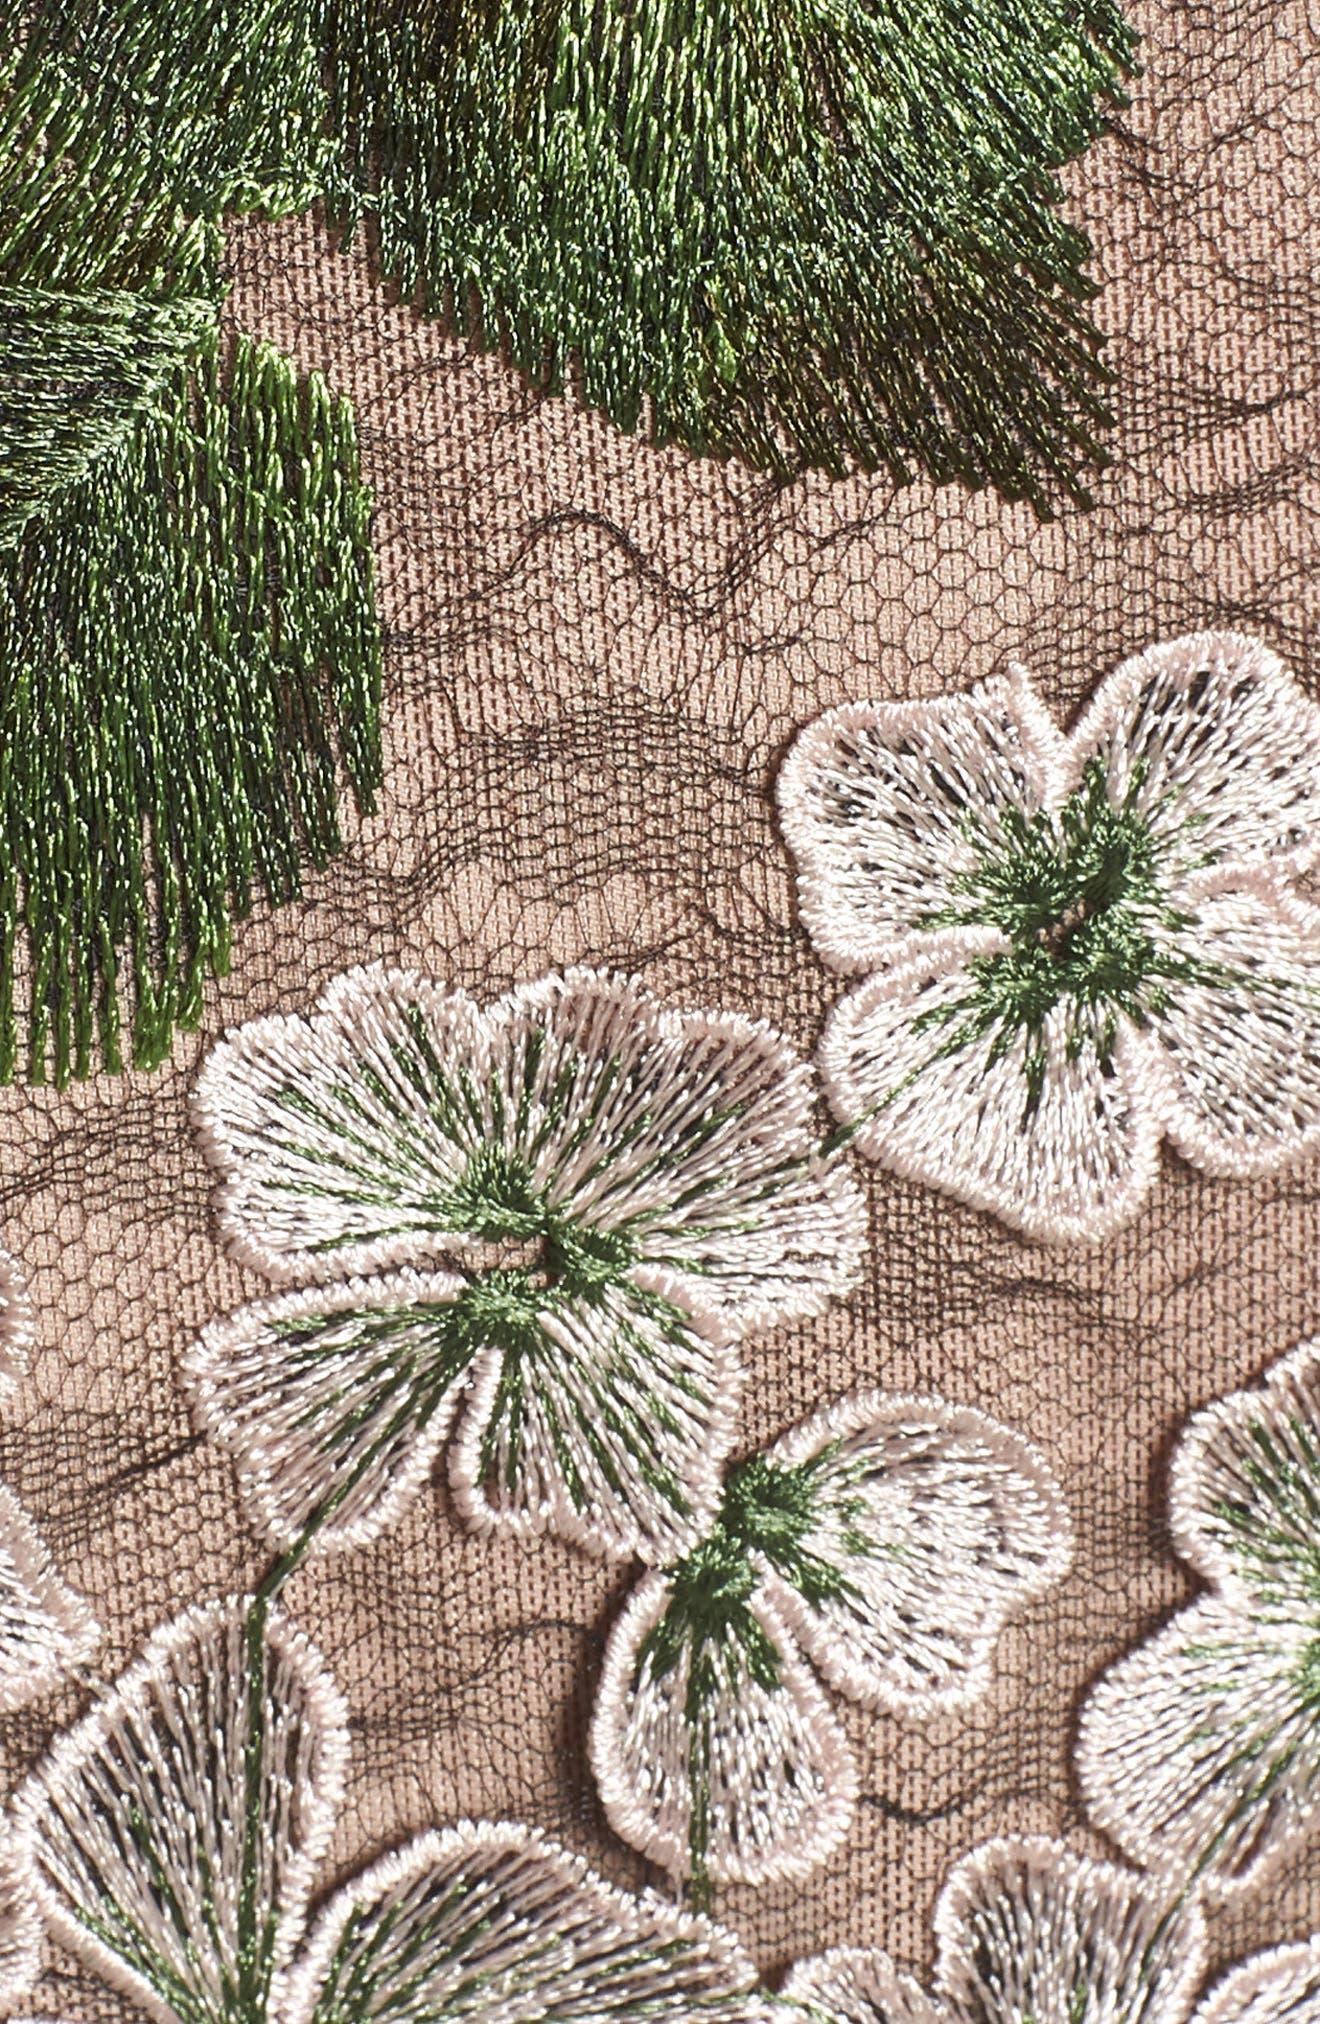 Cherry Hydrangea Lace Dress,                             Alternate thumbnail 5, color,                             Multicolor Pink